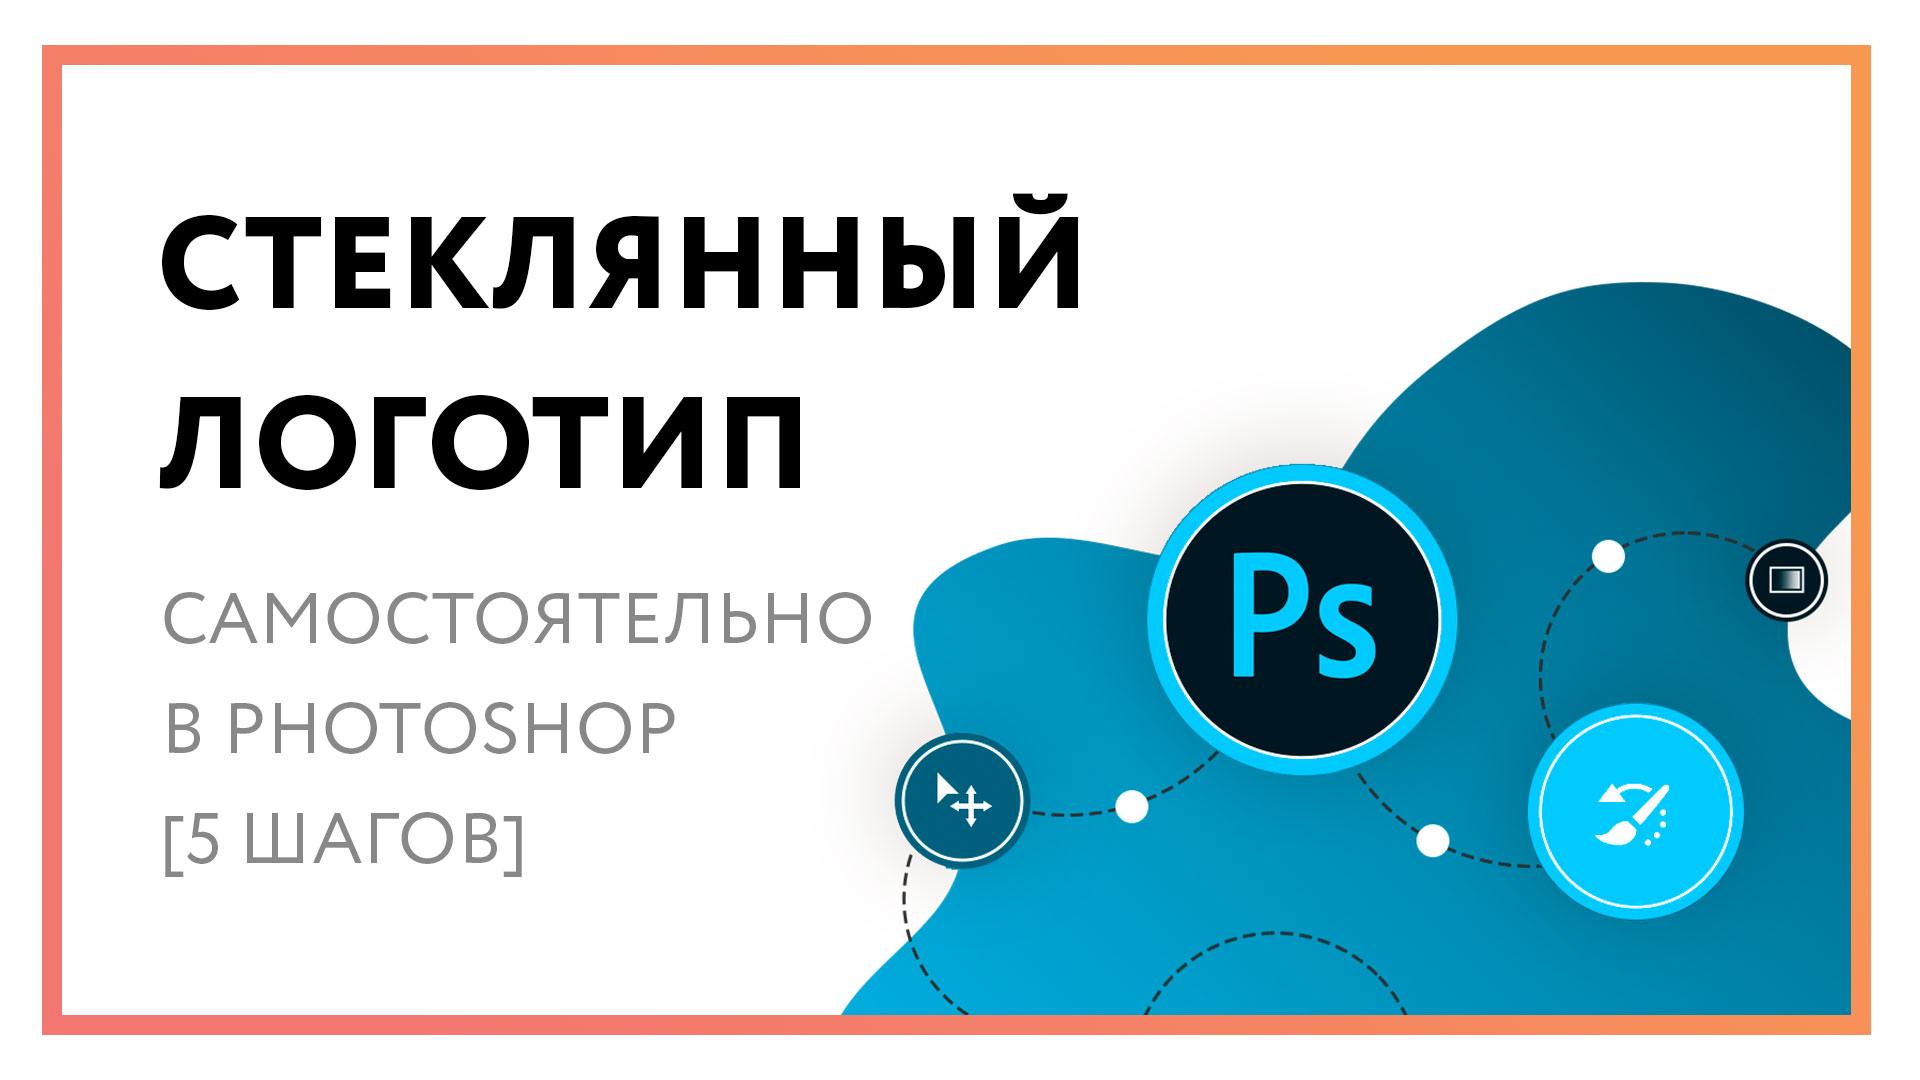 Стеклянный-логотип.jpg